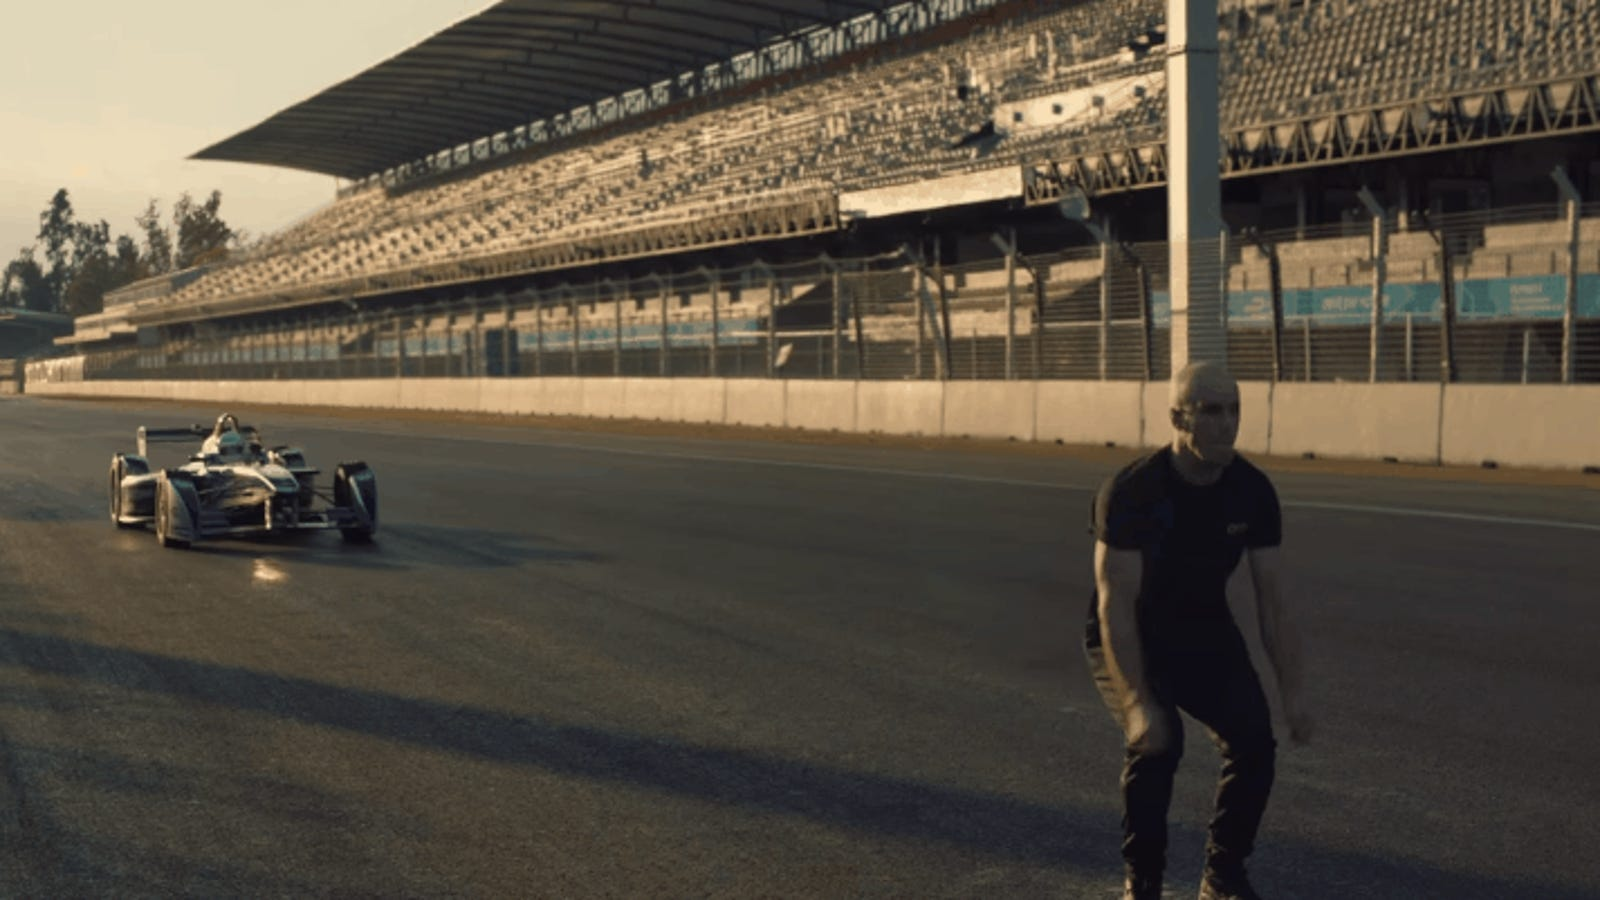 Parkour extremo: así es dar un salto de espalda sobre un auto de Fórmula E a 100 Km/h